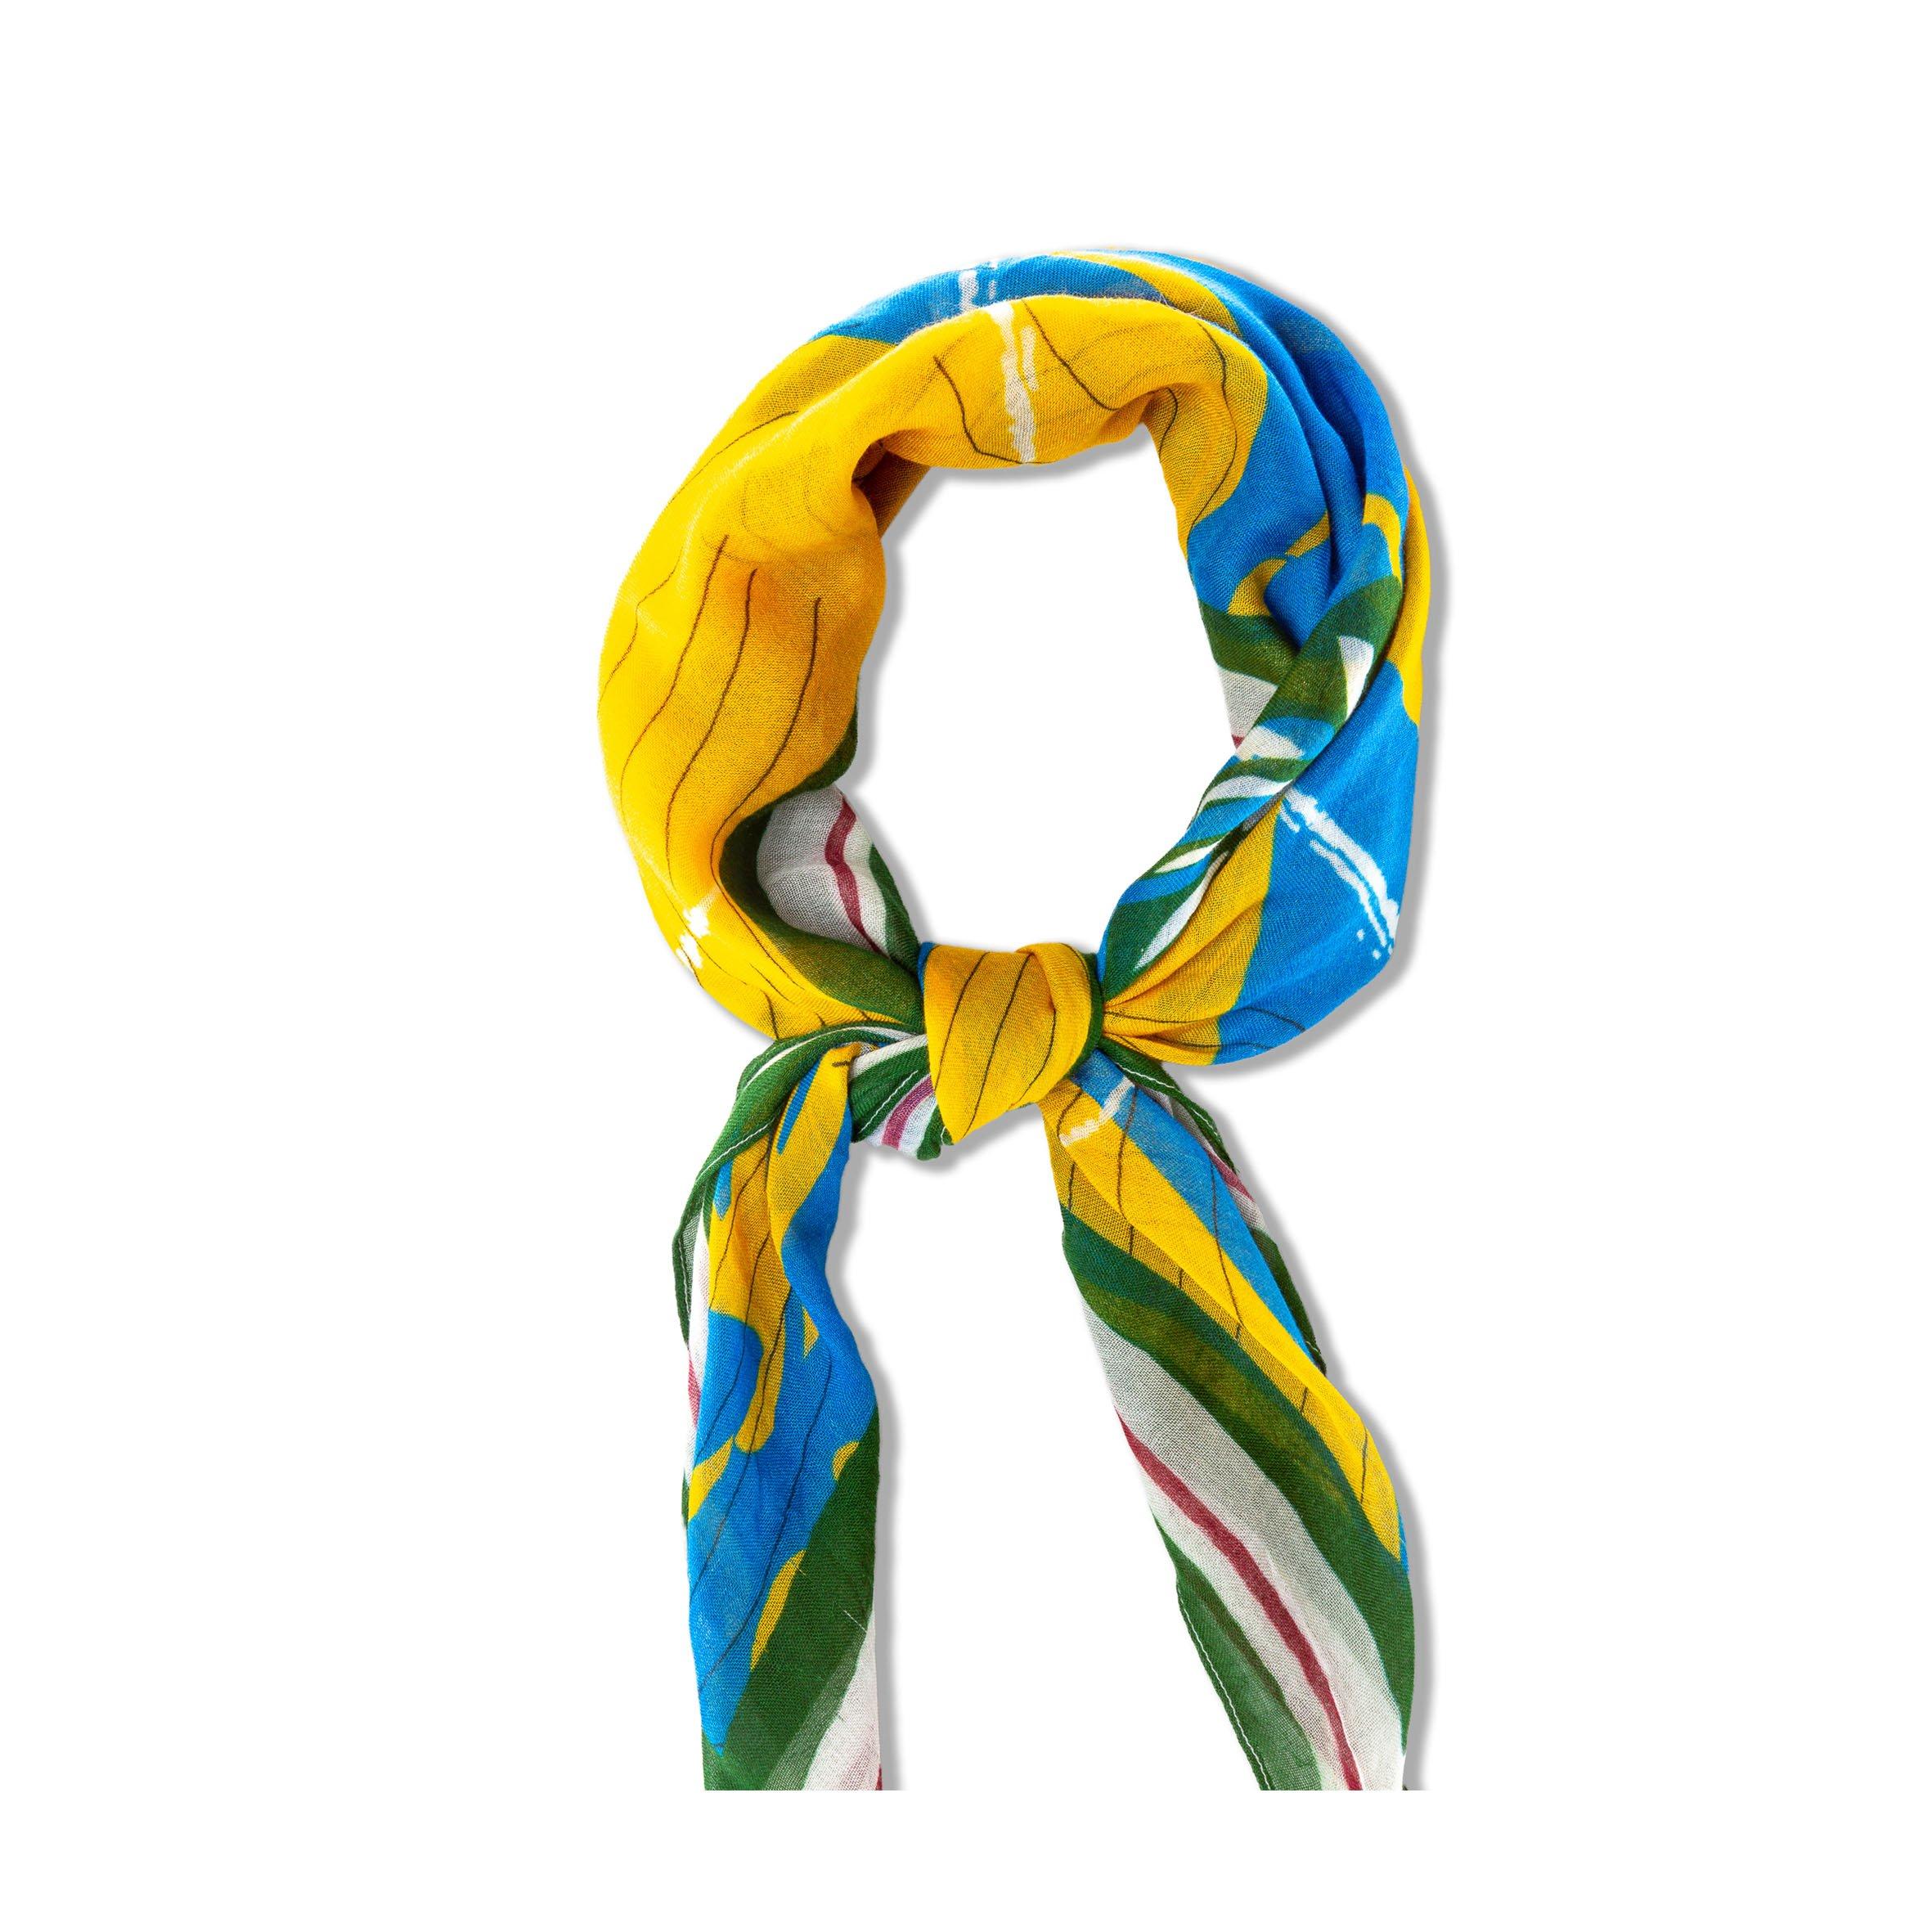 Headscarf Asmara Yellow & Blue from hatsup